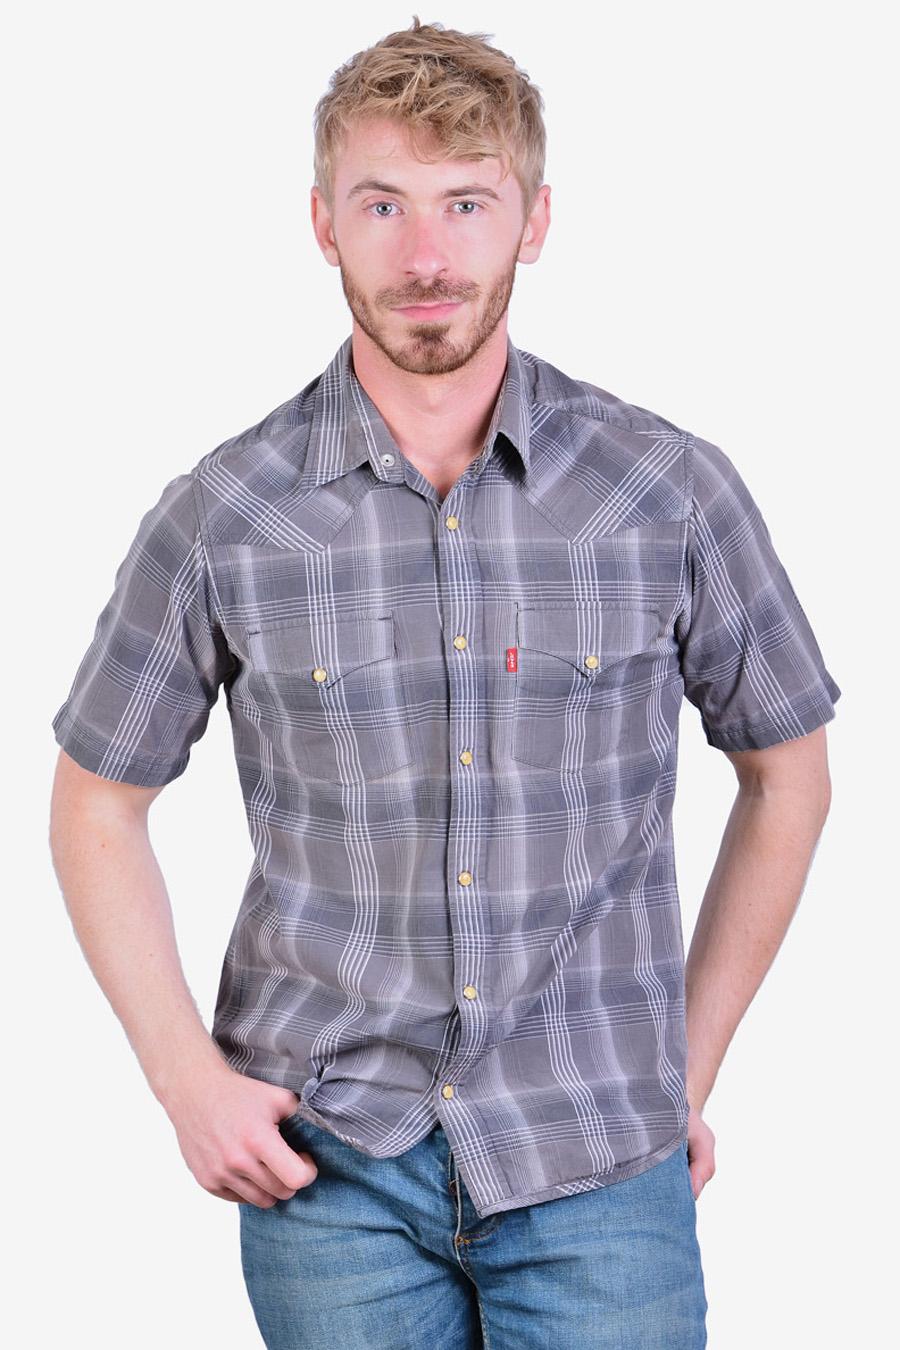 Vintage Levi's plaid western shirt